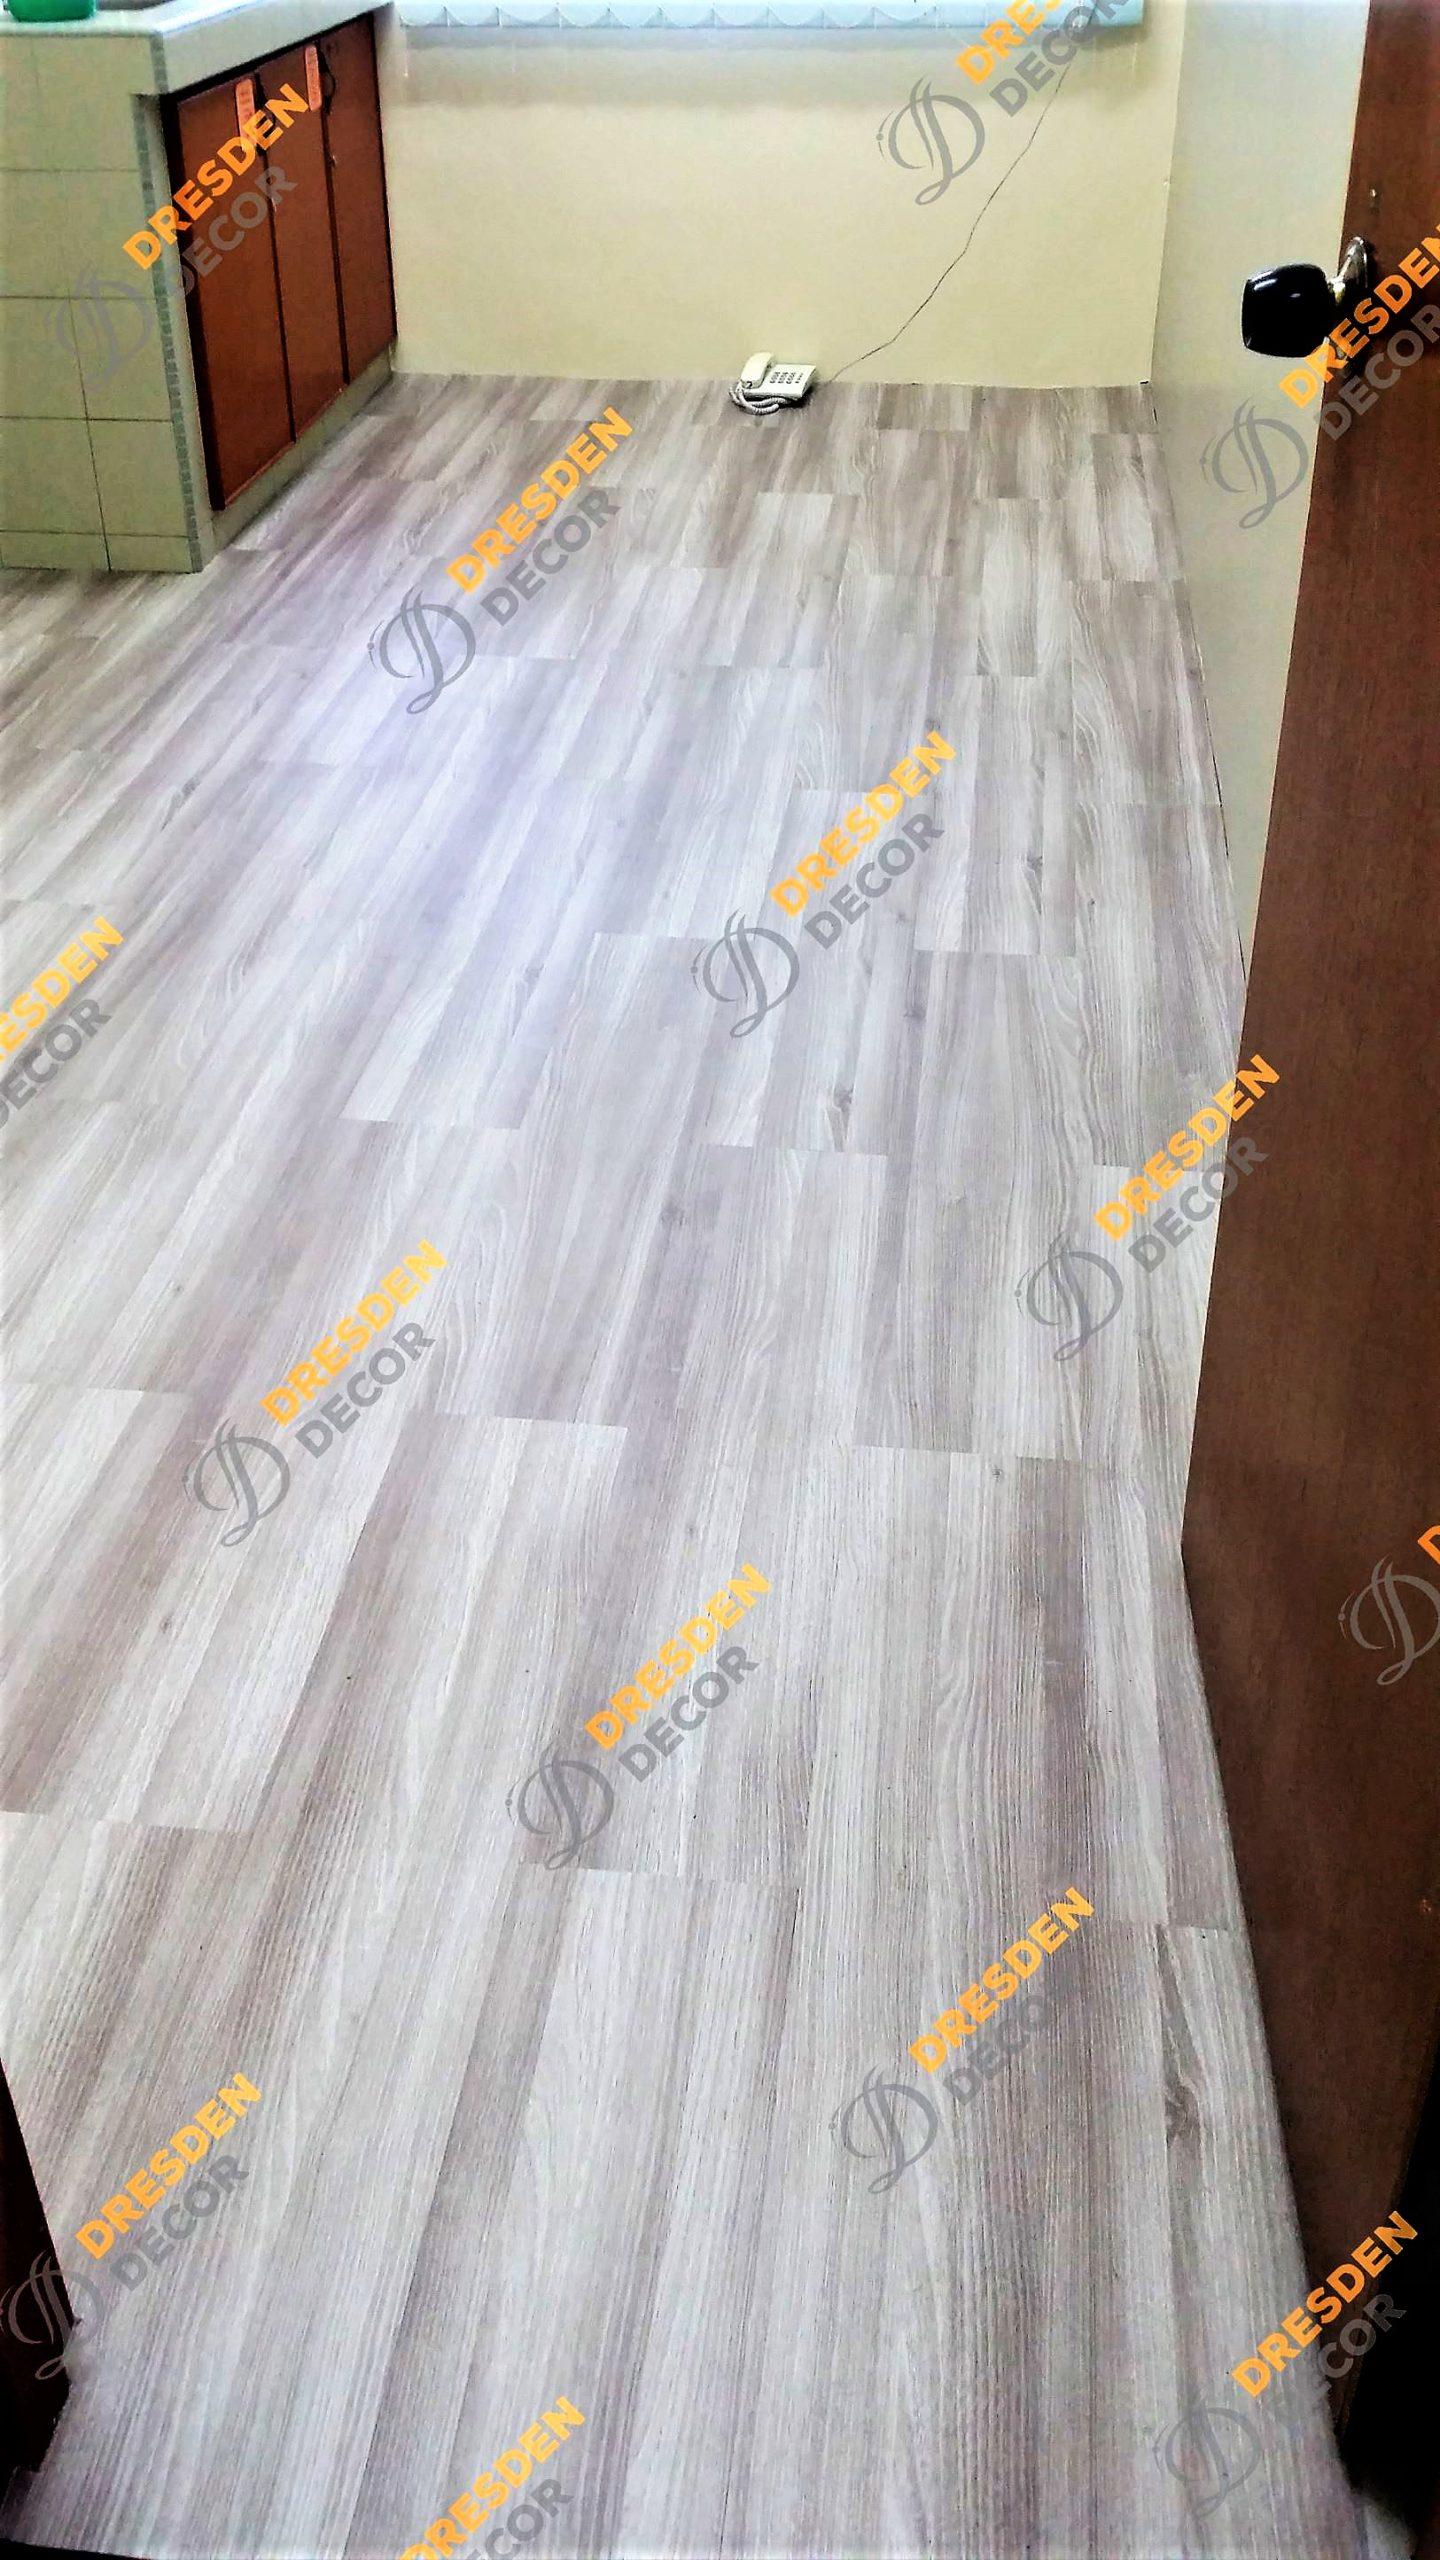 Sime Darby Banting Plantation 3.0mm PVC Korean Vinyl Plank